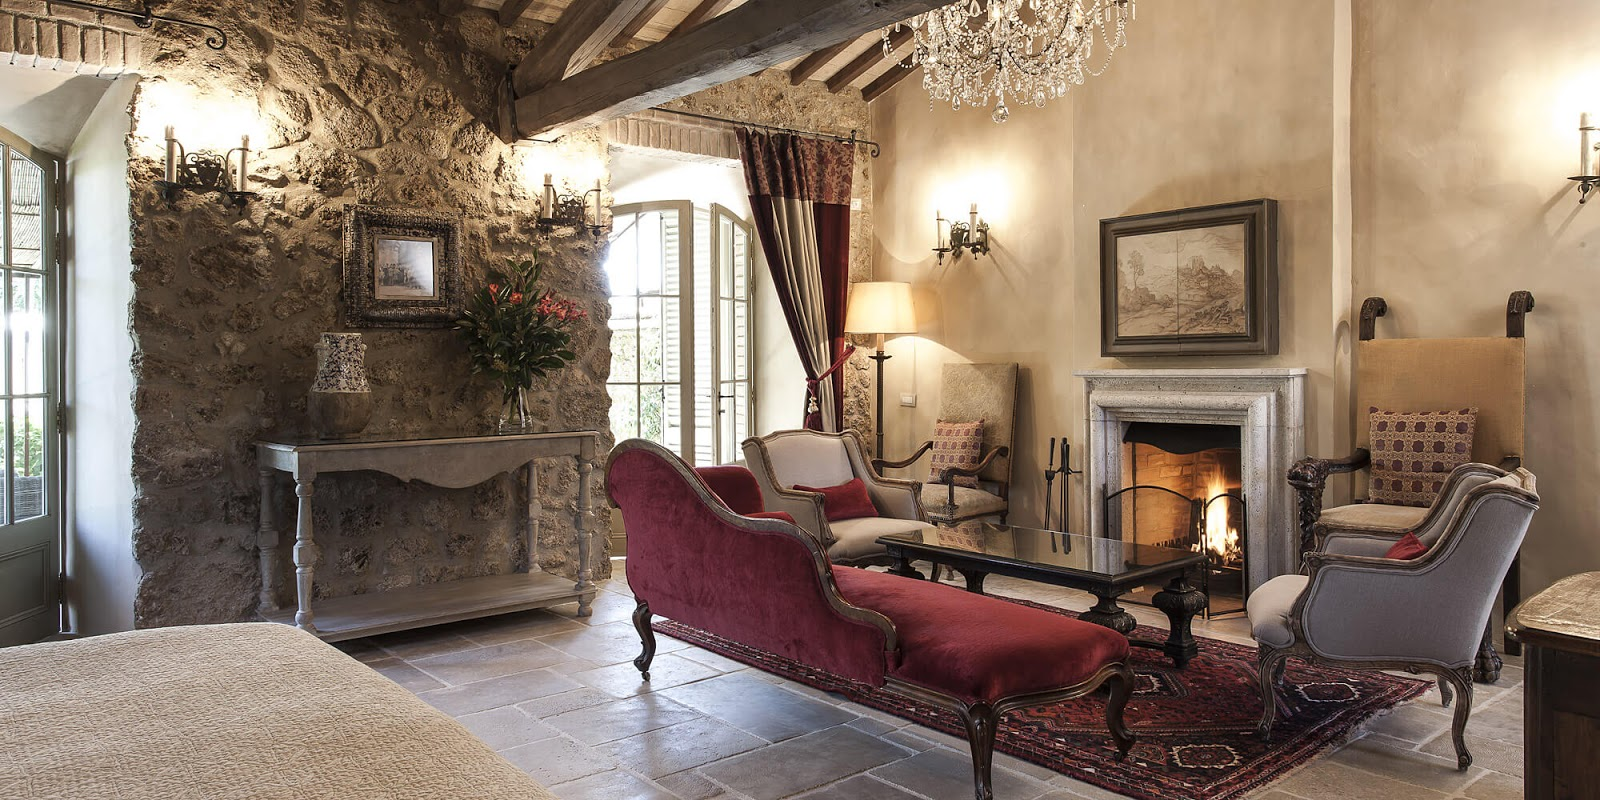 Breathtaking suite at the Italian villa Borgo Santo Pietro - found on Hello Lovely Studio